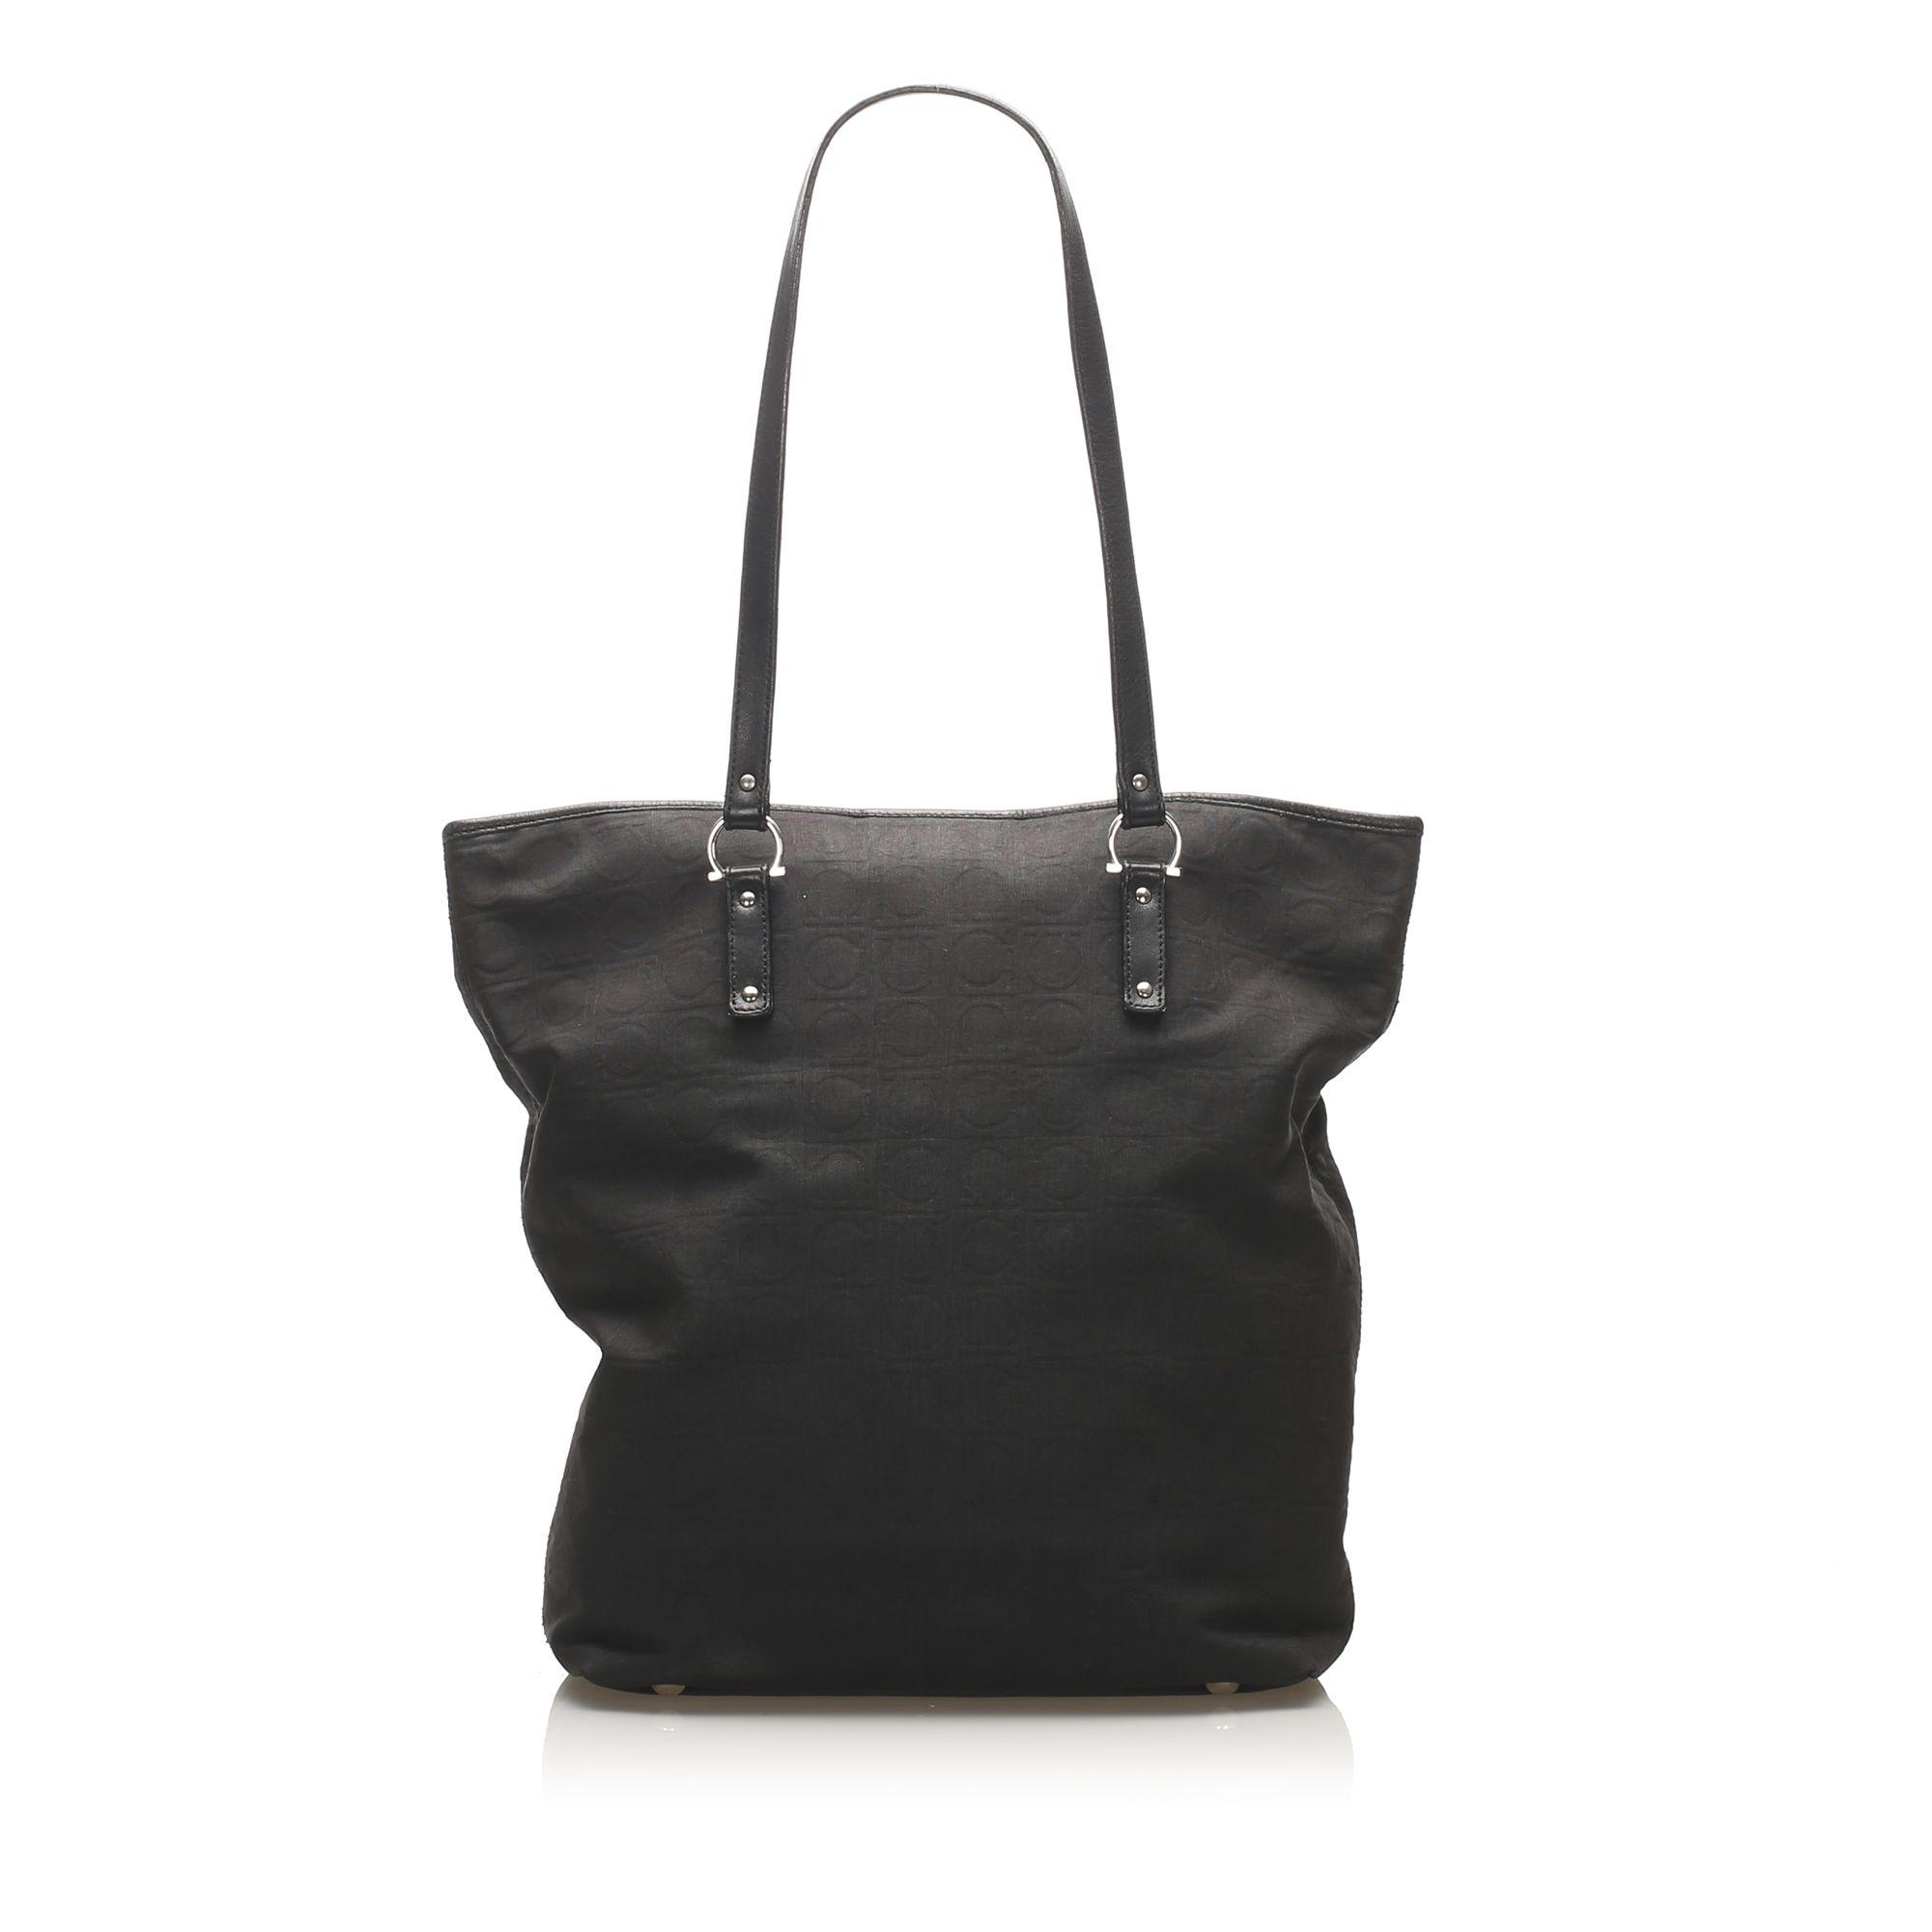 Vintage Ferragamo Gancini Nylon Tote Bag Black